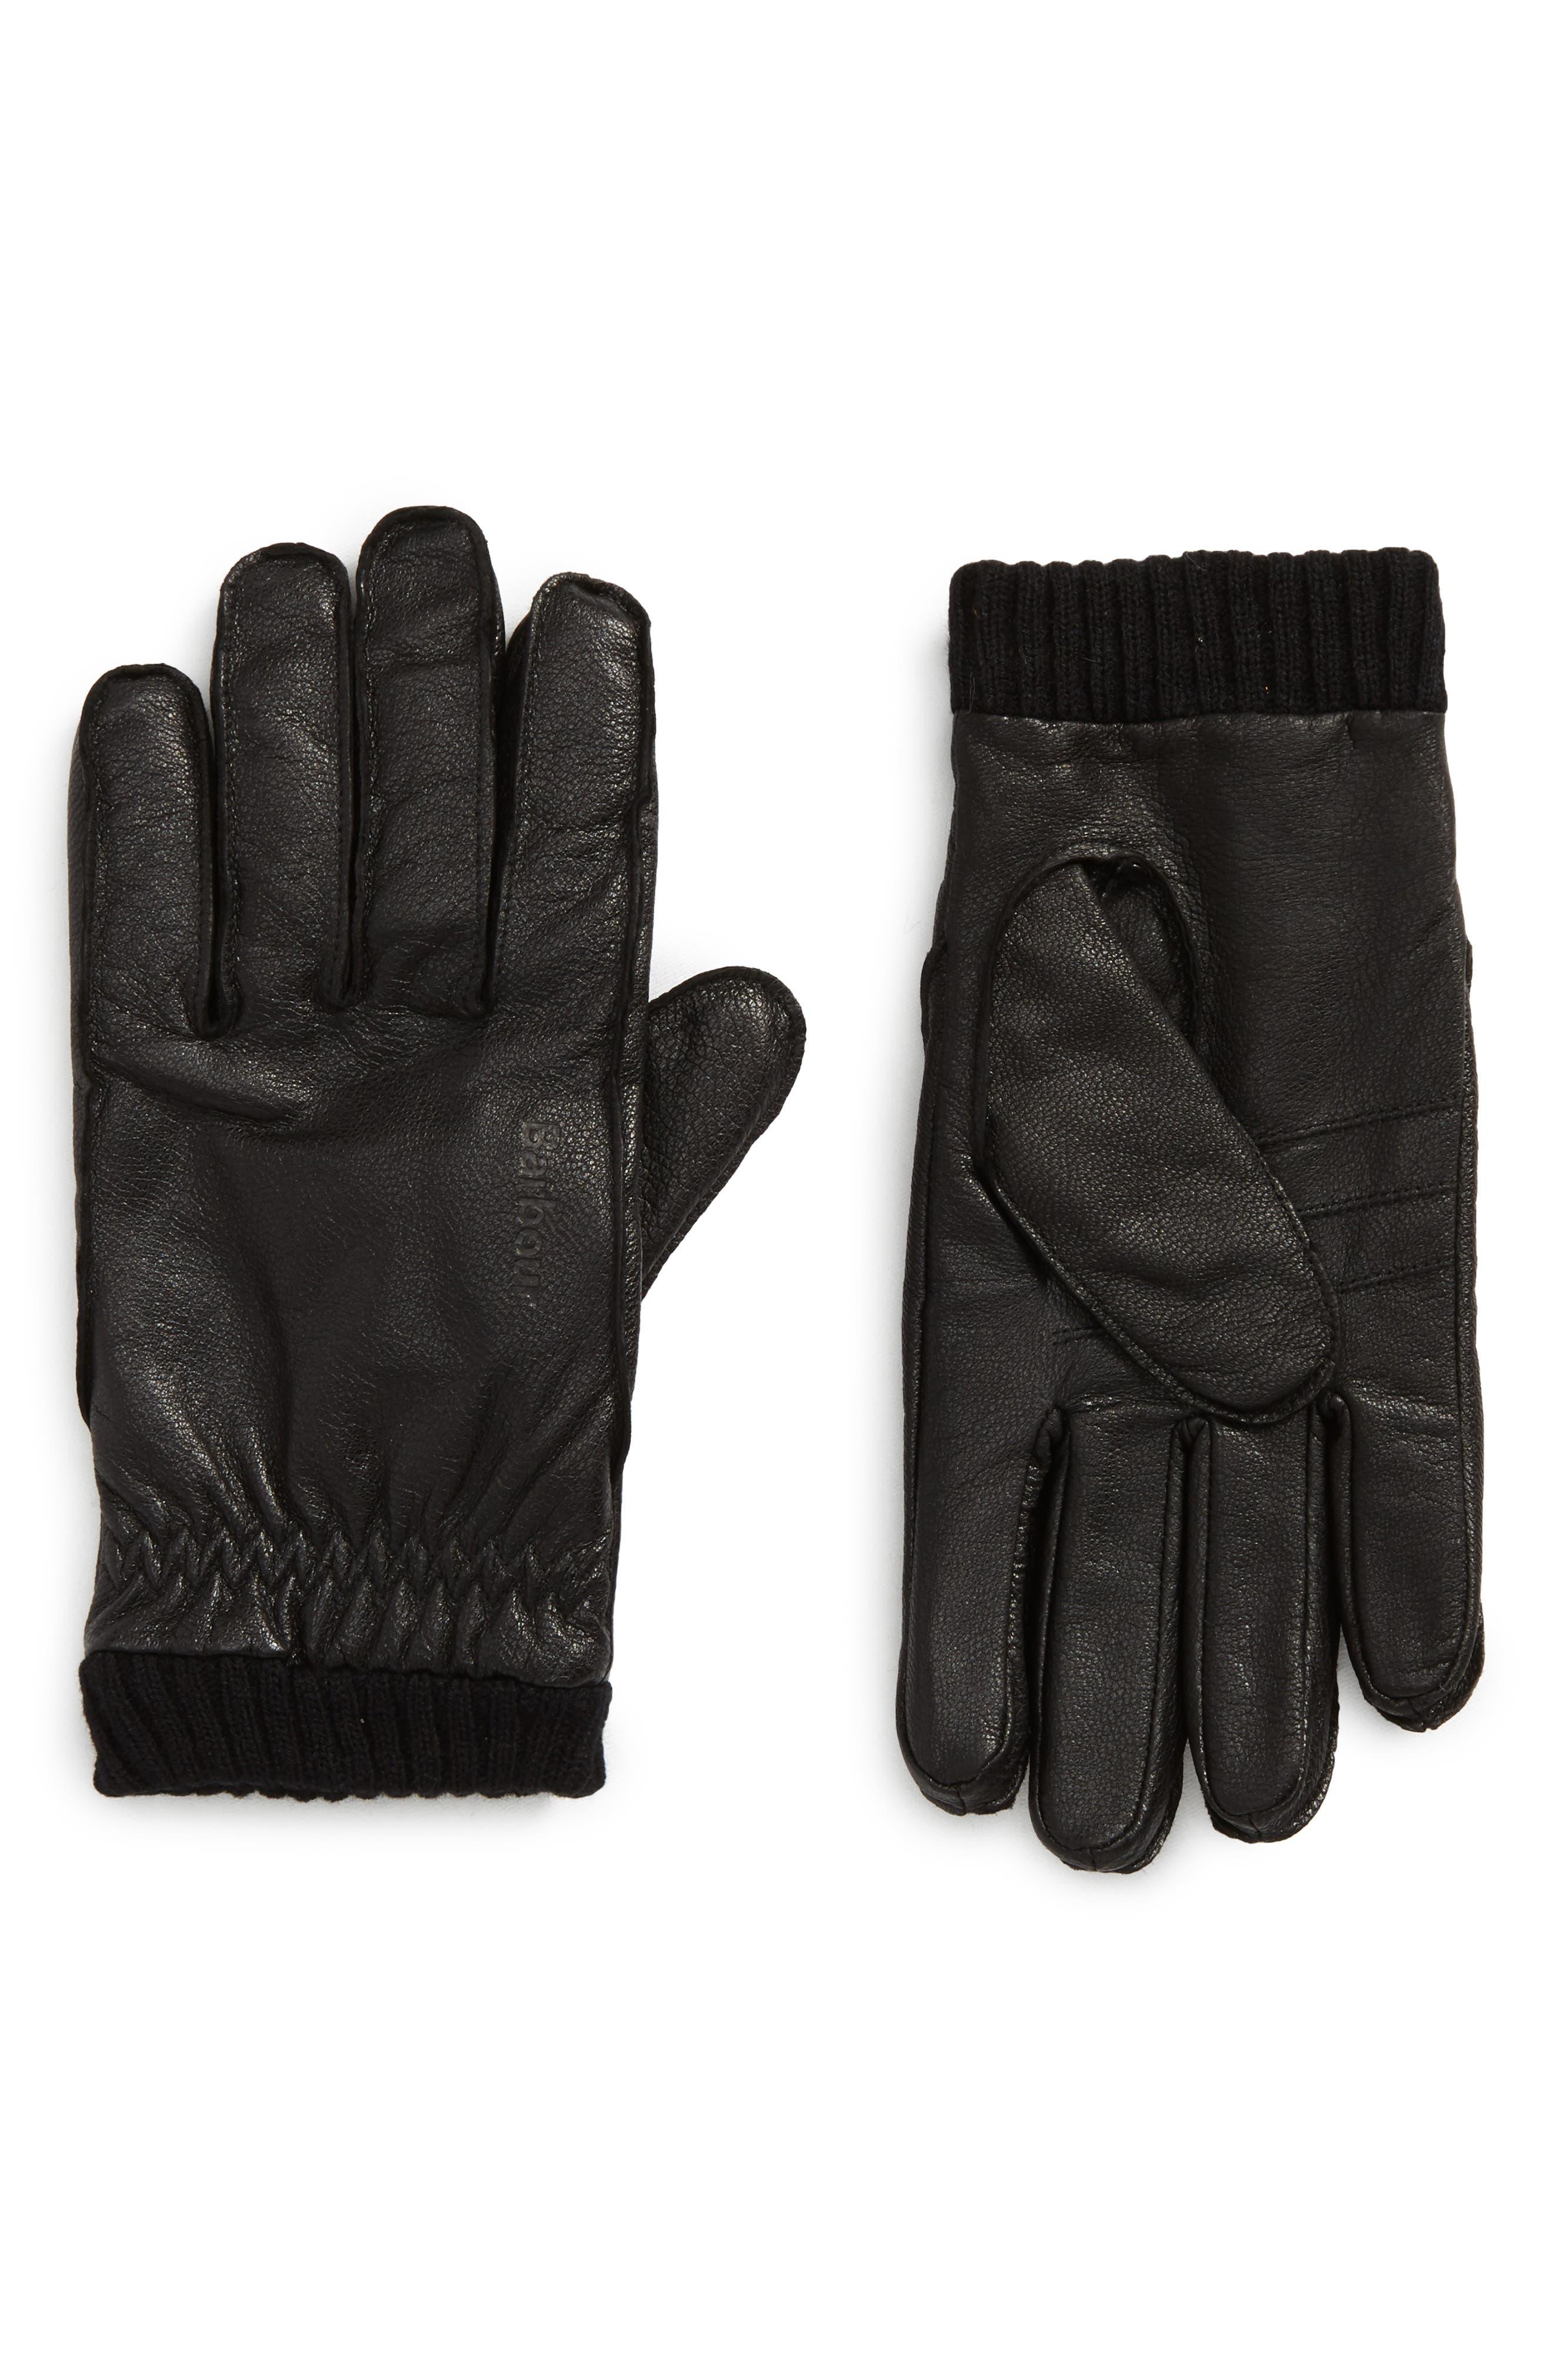 Barrow Leather Gloves,                         Main,                         color, Black